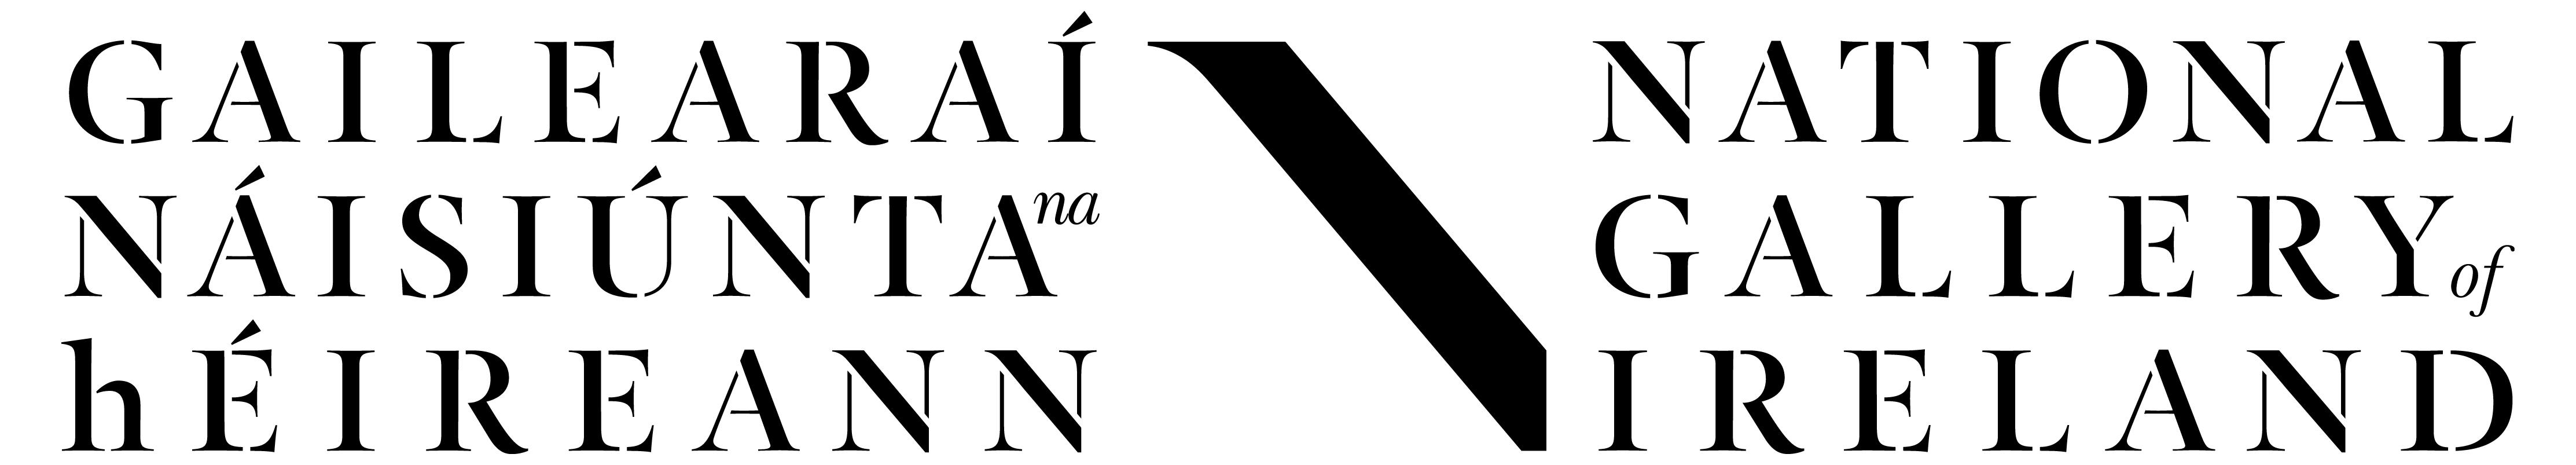 National Gallery of Ireland Logo